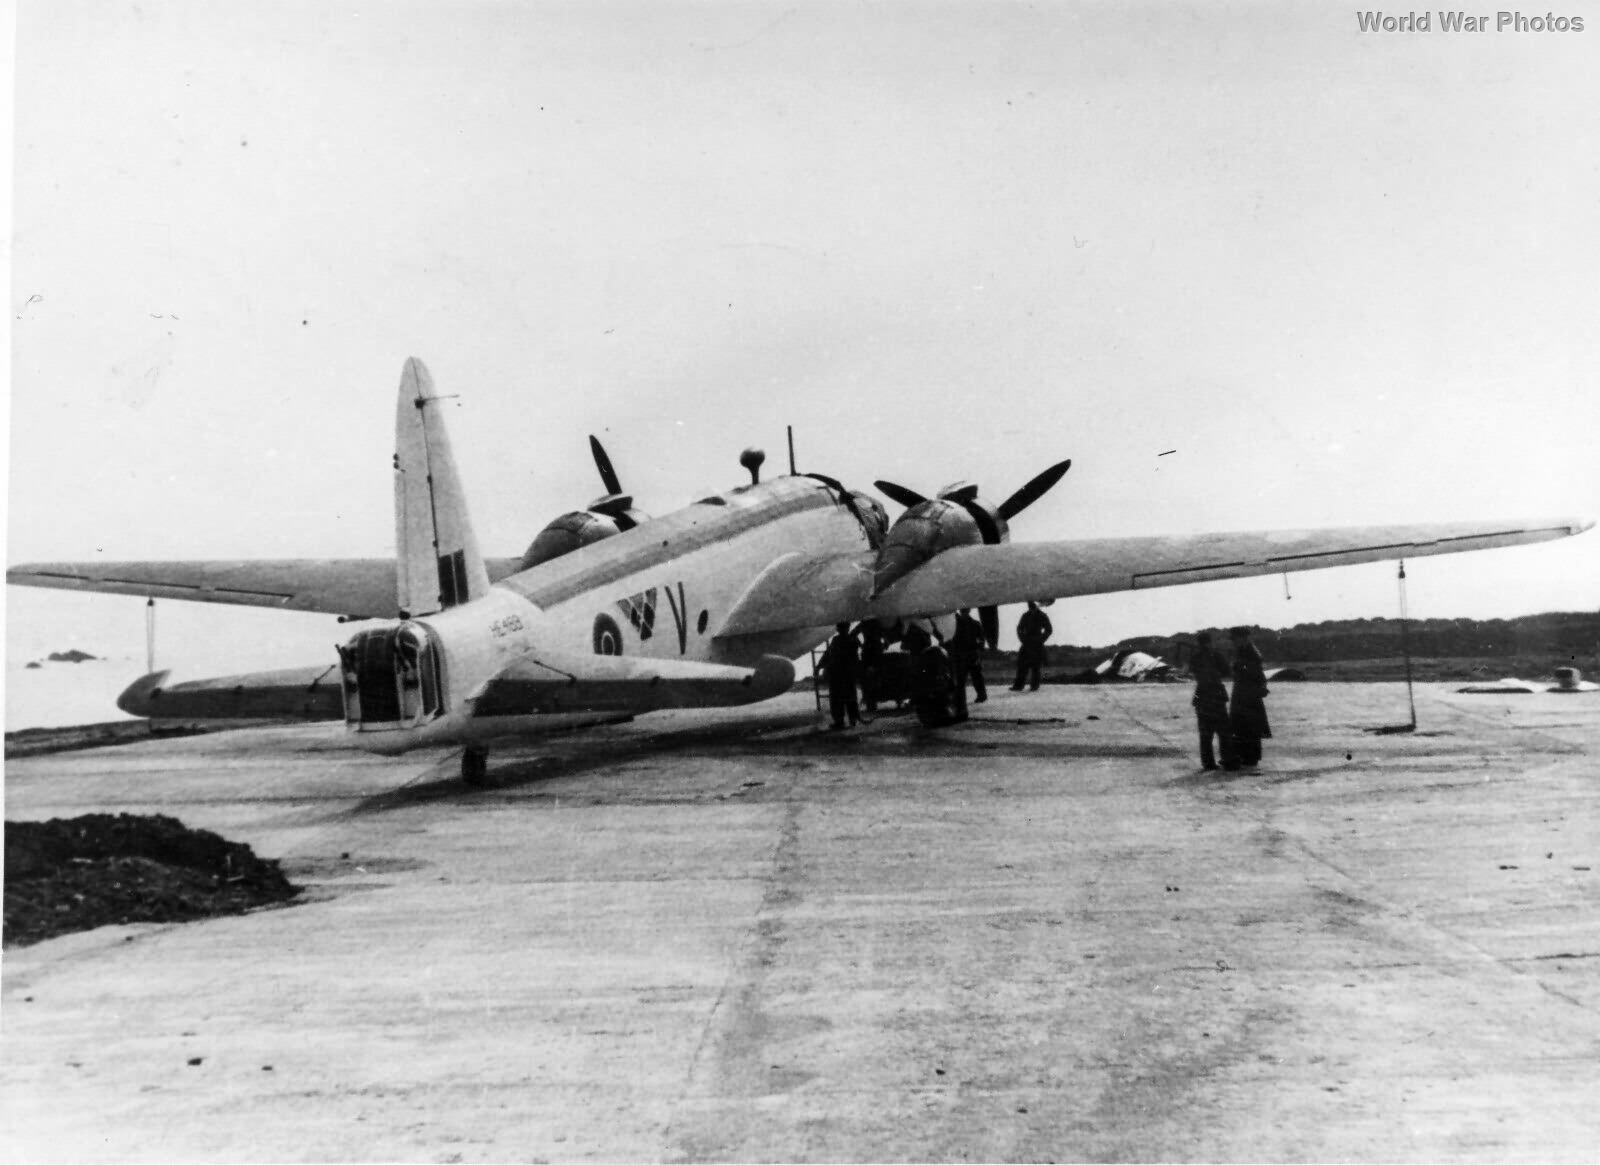 Wellington Mk X HE488 of No. 304 Polish Bomber Squadron